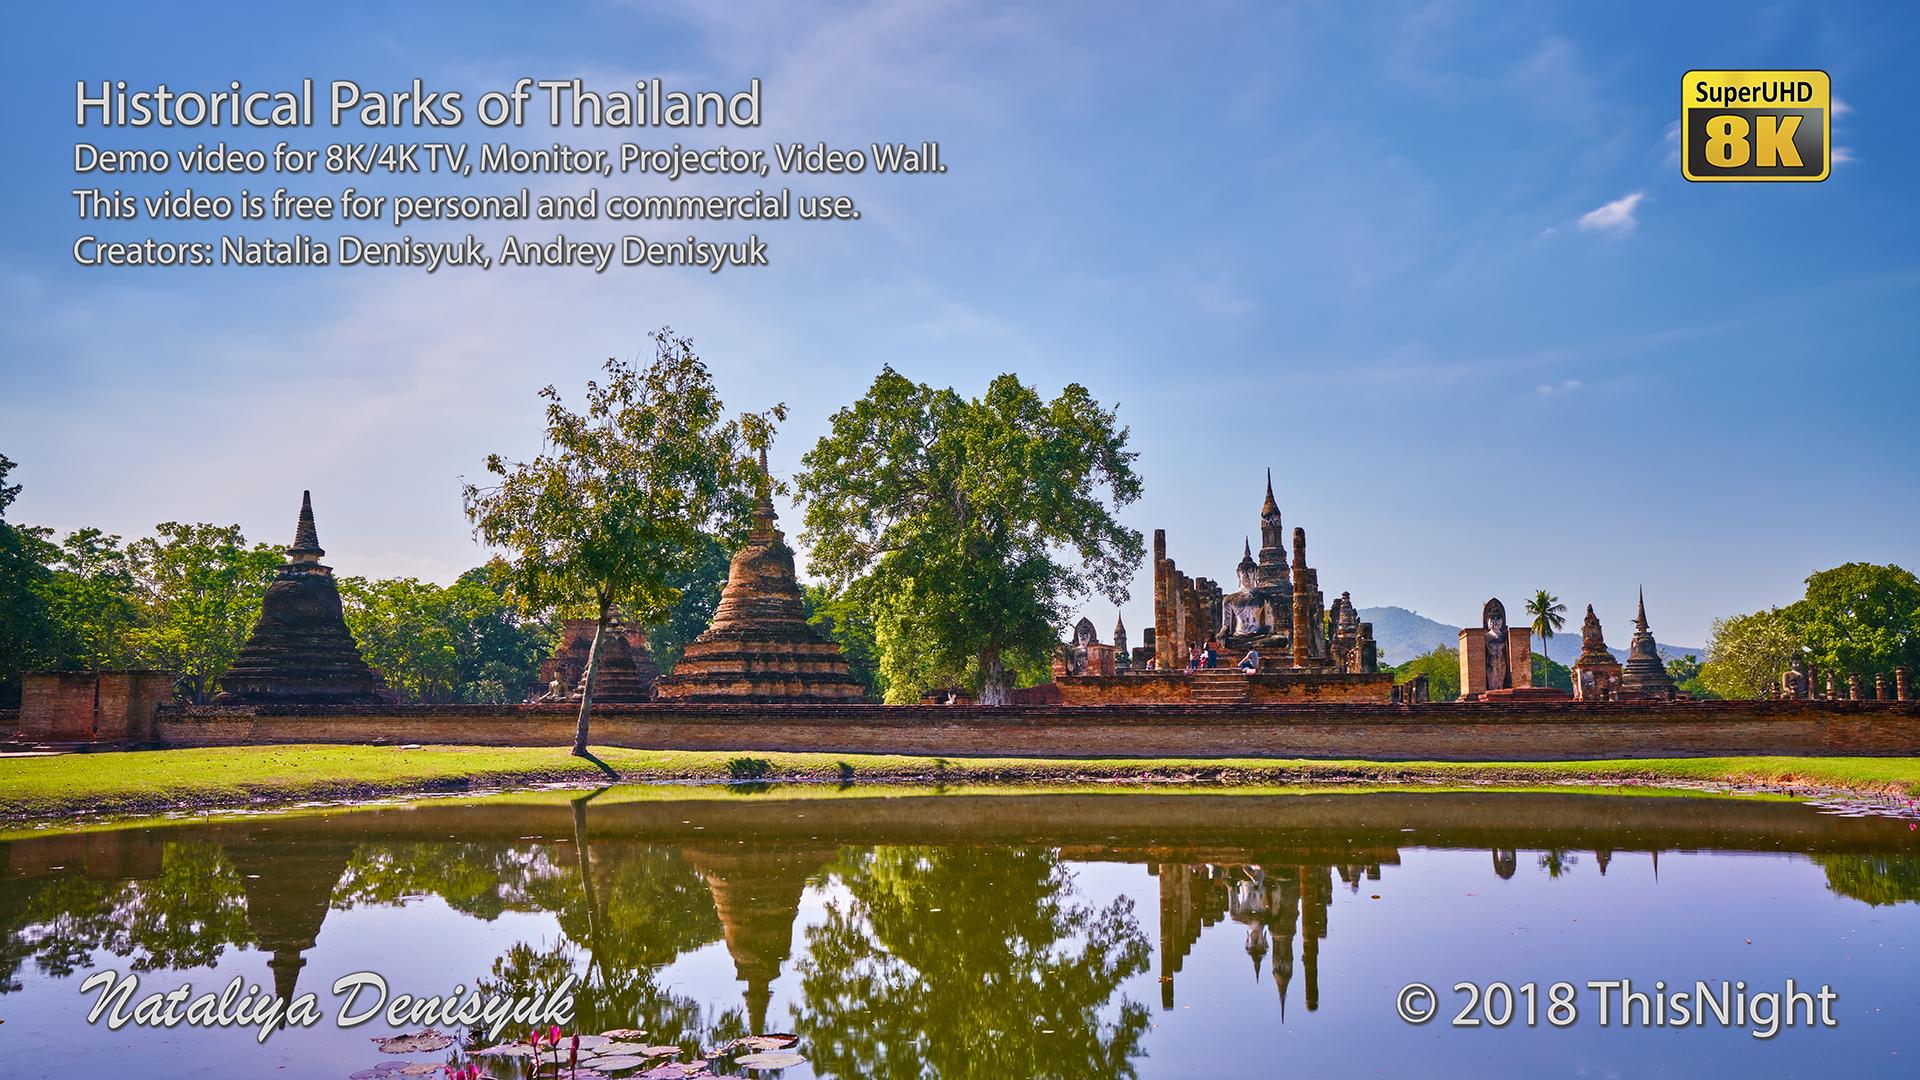 Historic Town of Sukhothai